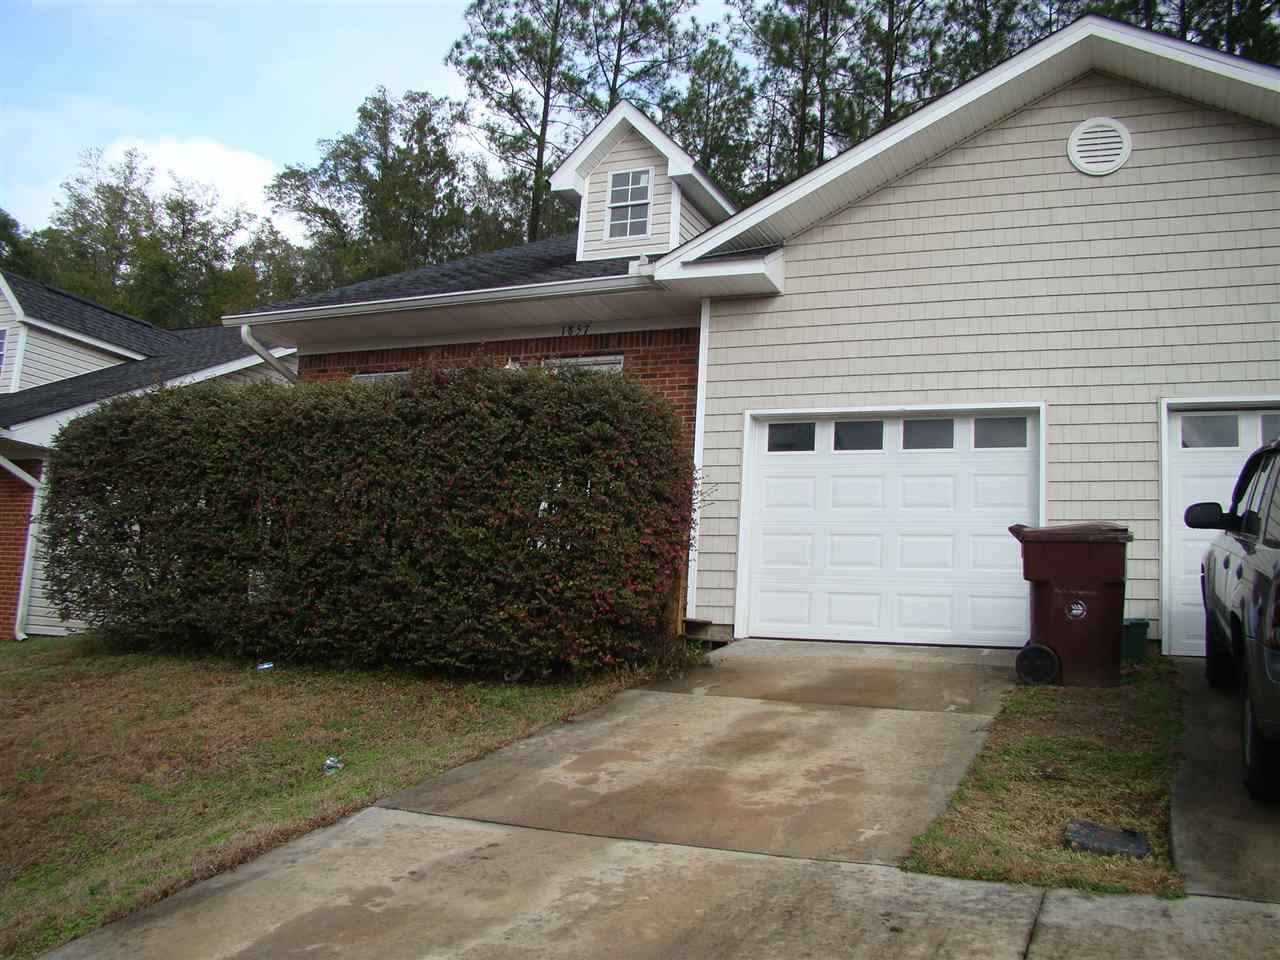 Property ID 312337